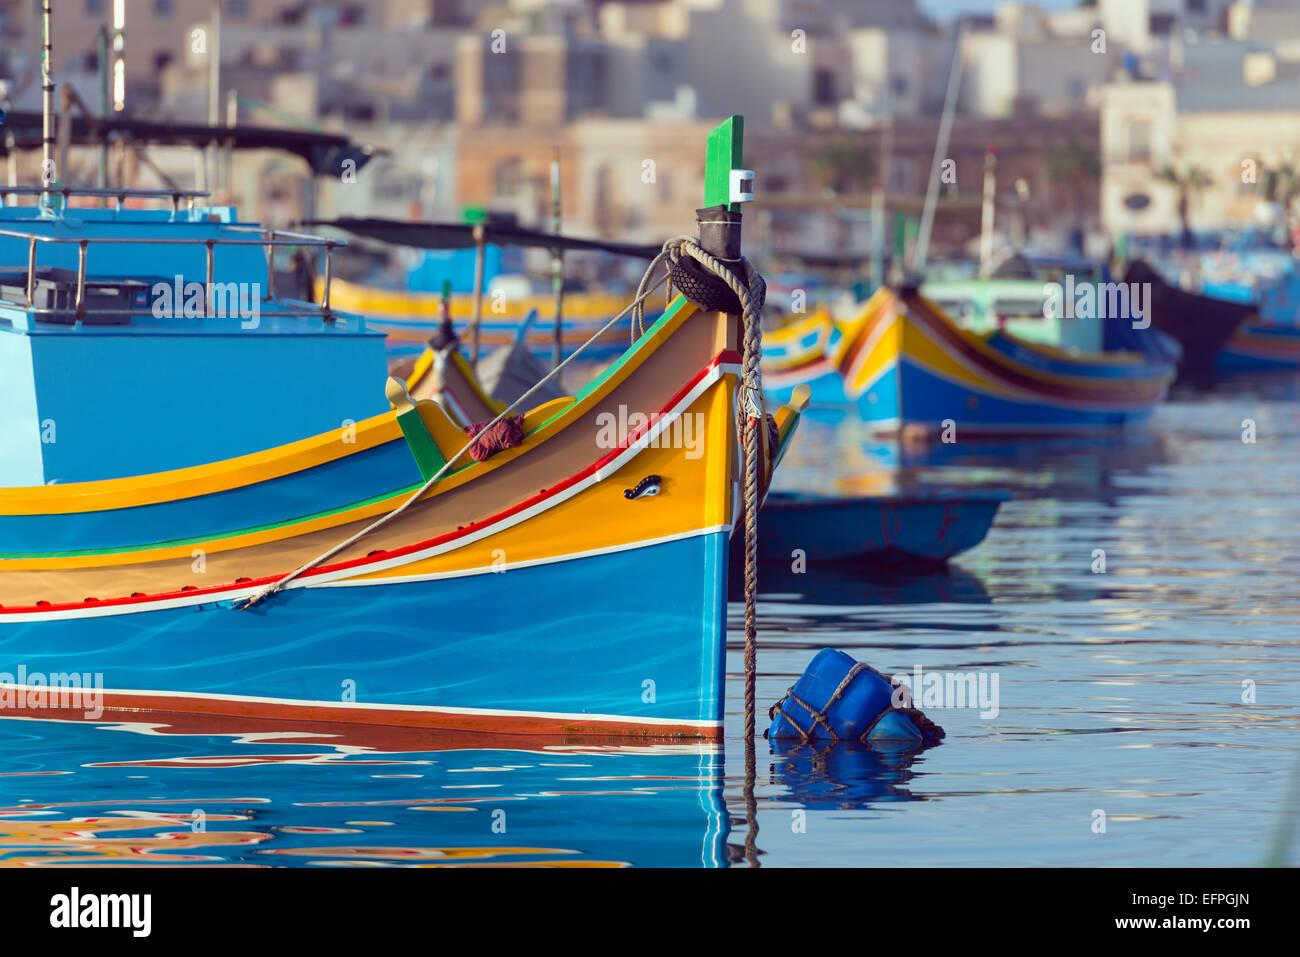 Colourful fishing boats (dghajsa), Marsaxlokk Harbour, Malta, Mediterranean, Europe Stock Photo